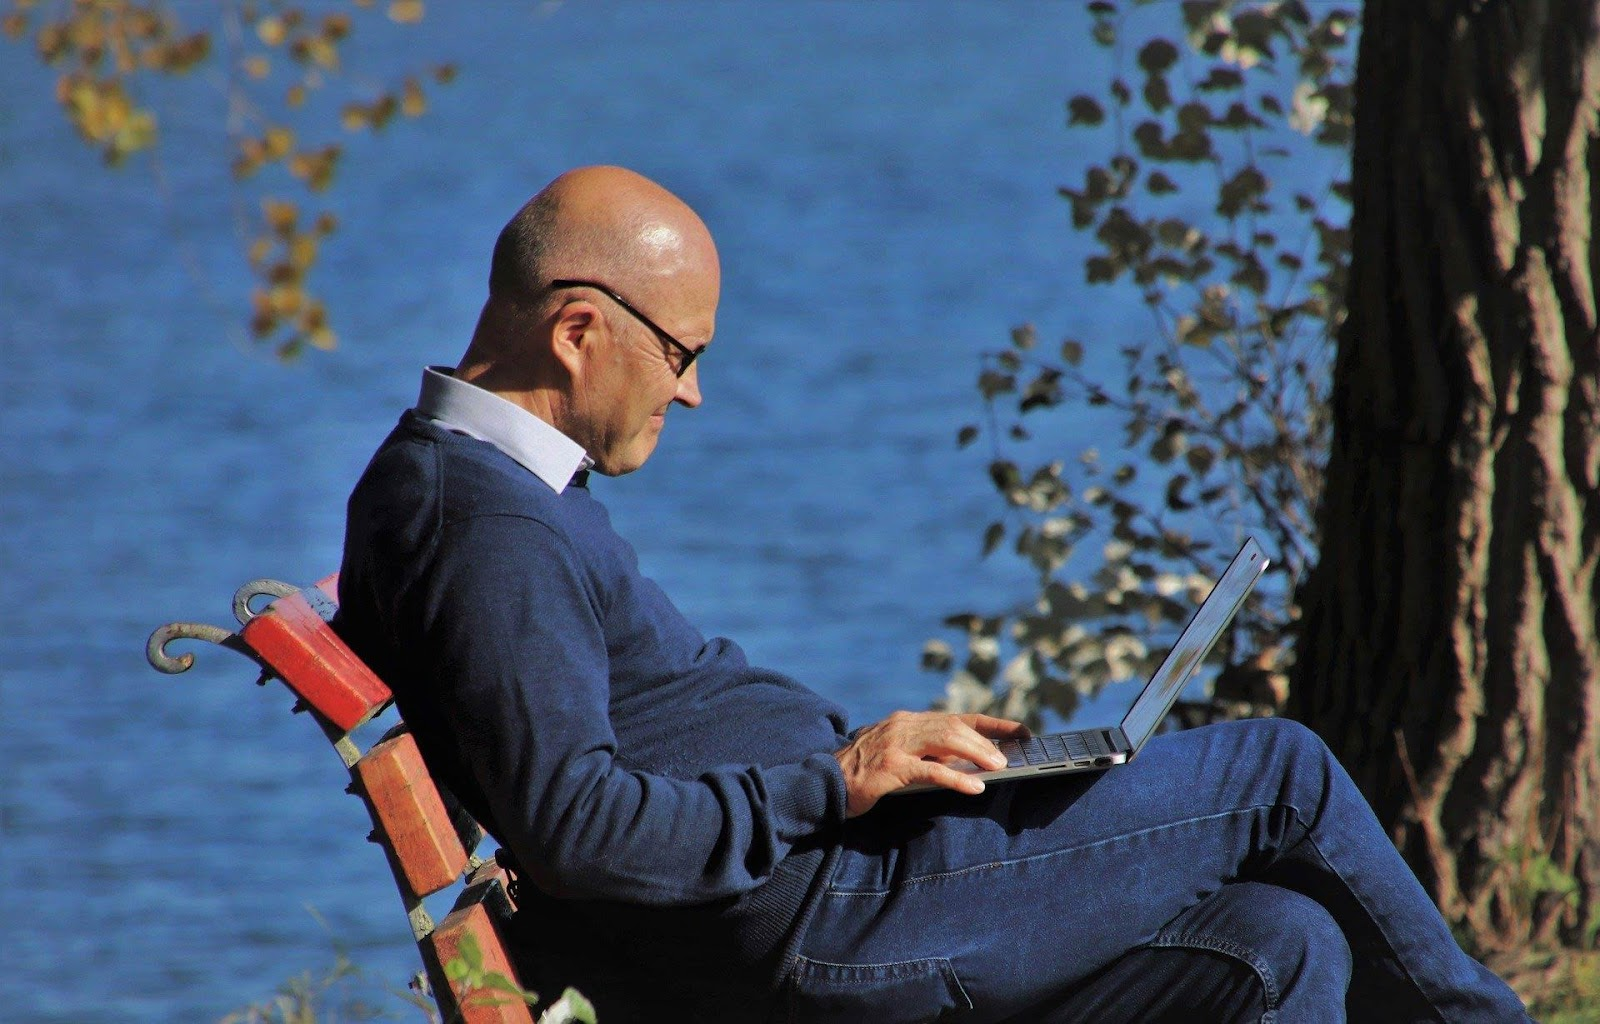 https://vendre-ses-photos-en-ligne.com/wp-content/uploads/2020/03/laptop-relax.jpg